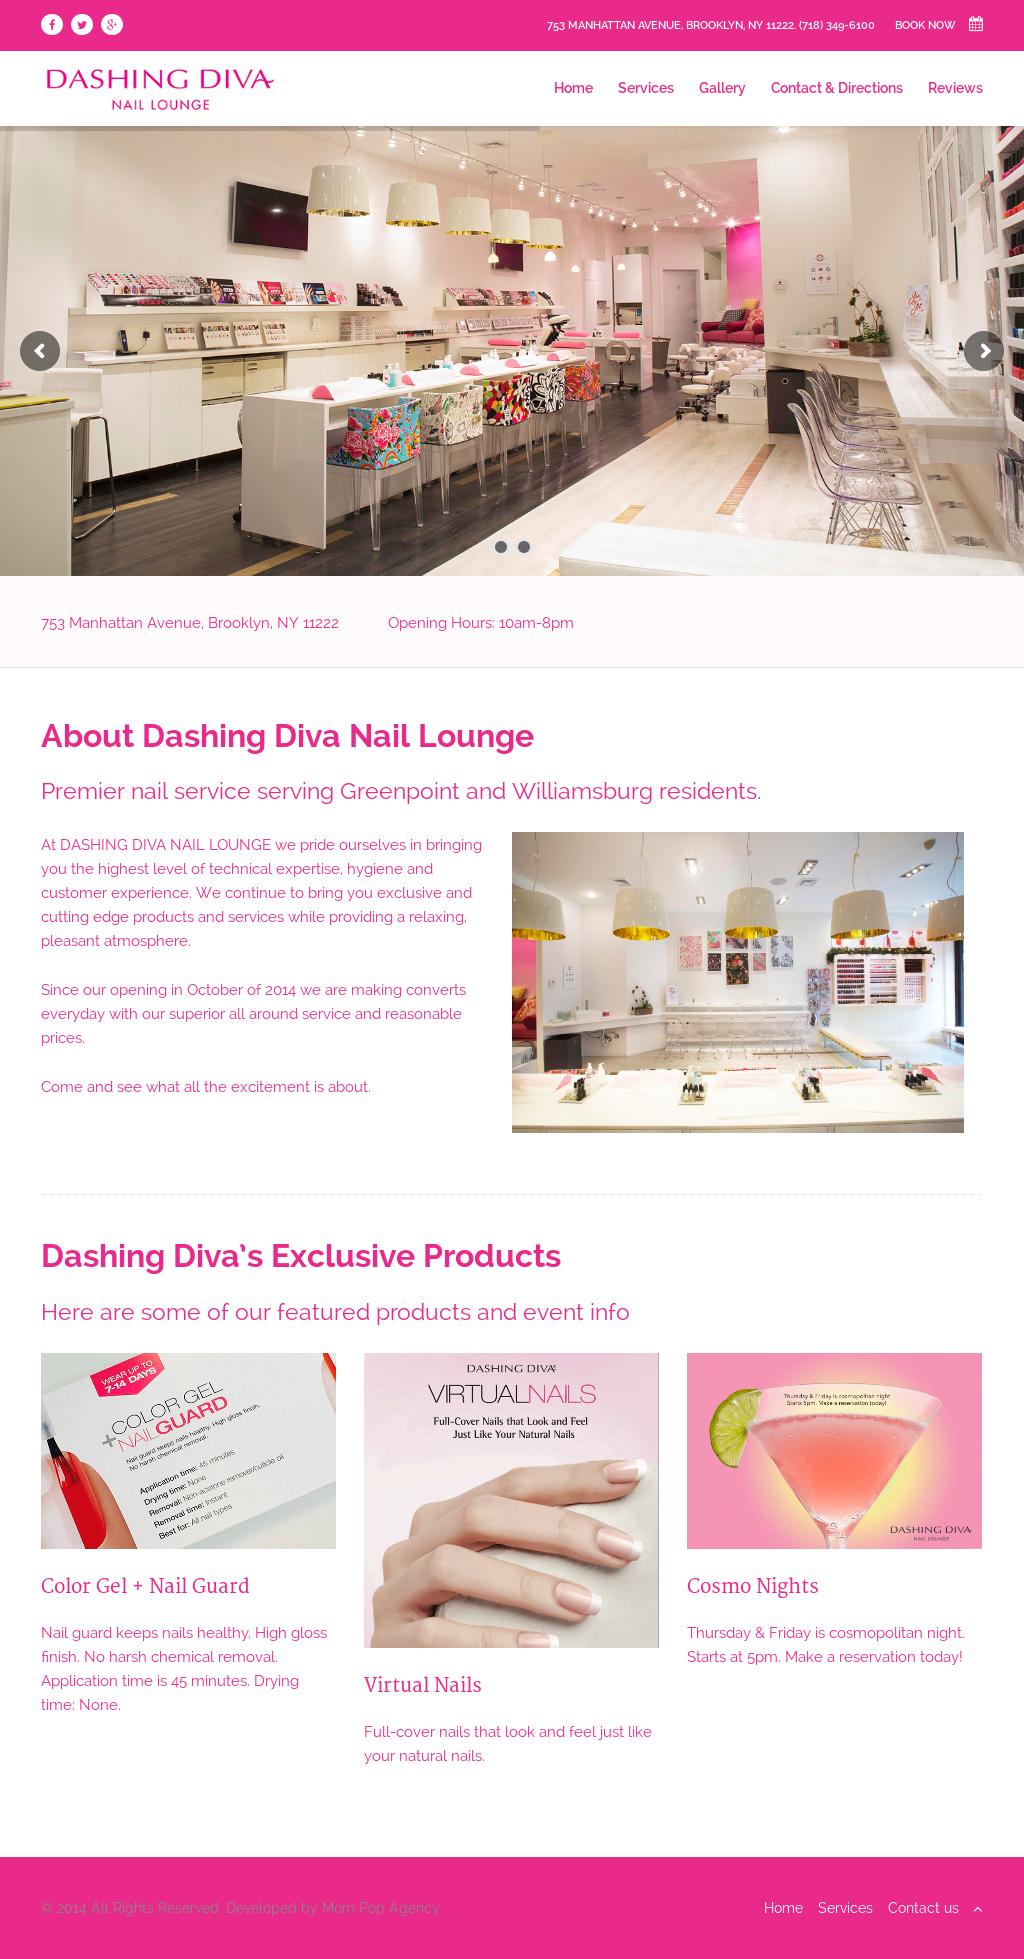 Modern Dashing Diva Nail Guard Festooning - Nail Art Ideas ...